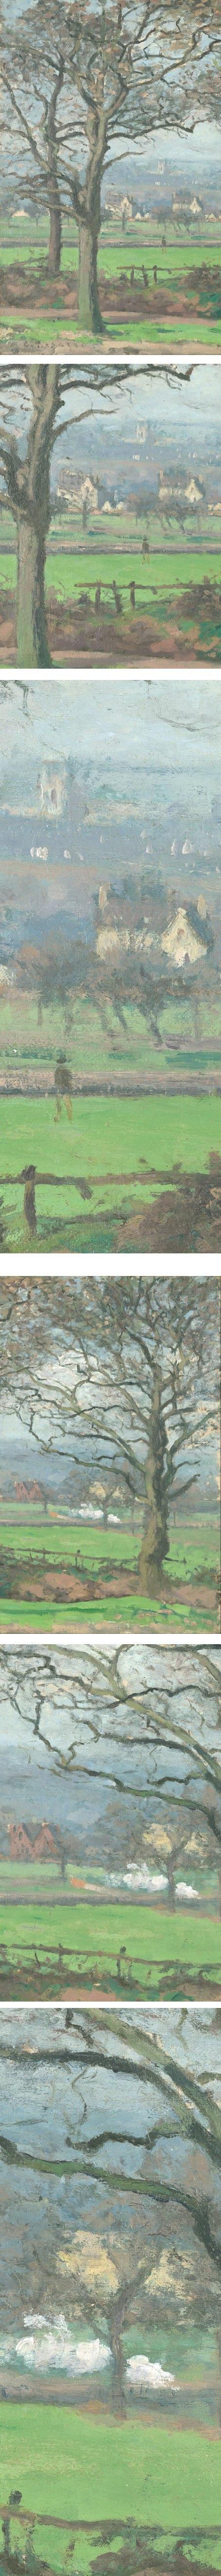 Near Sydenham Hill, Camille Pissarro (details)